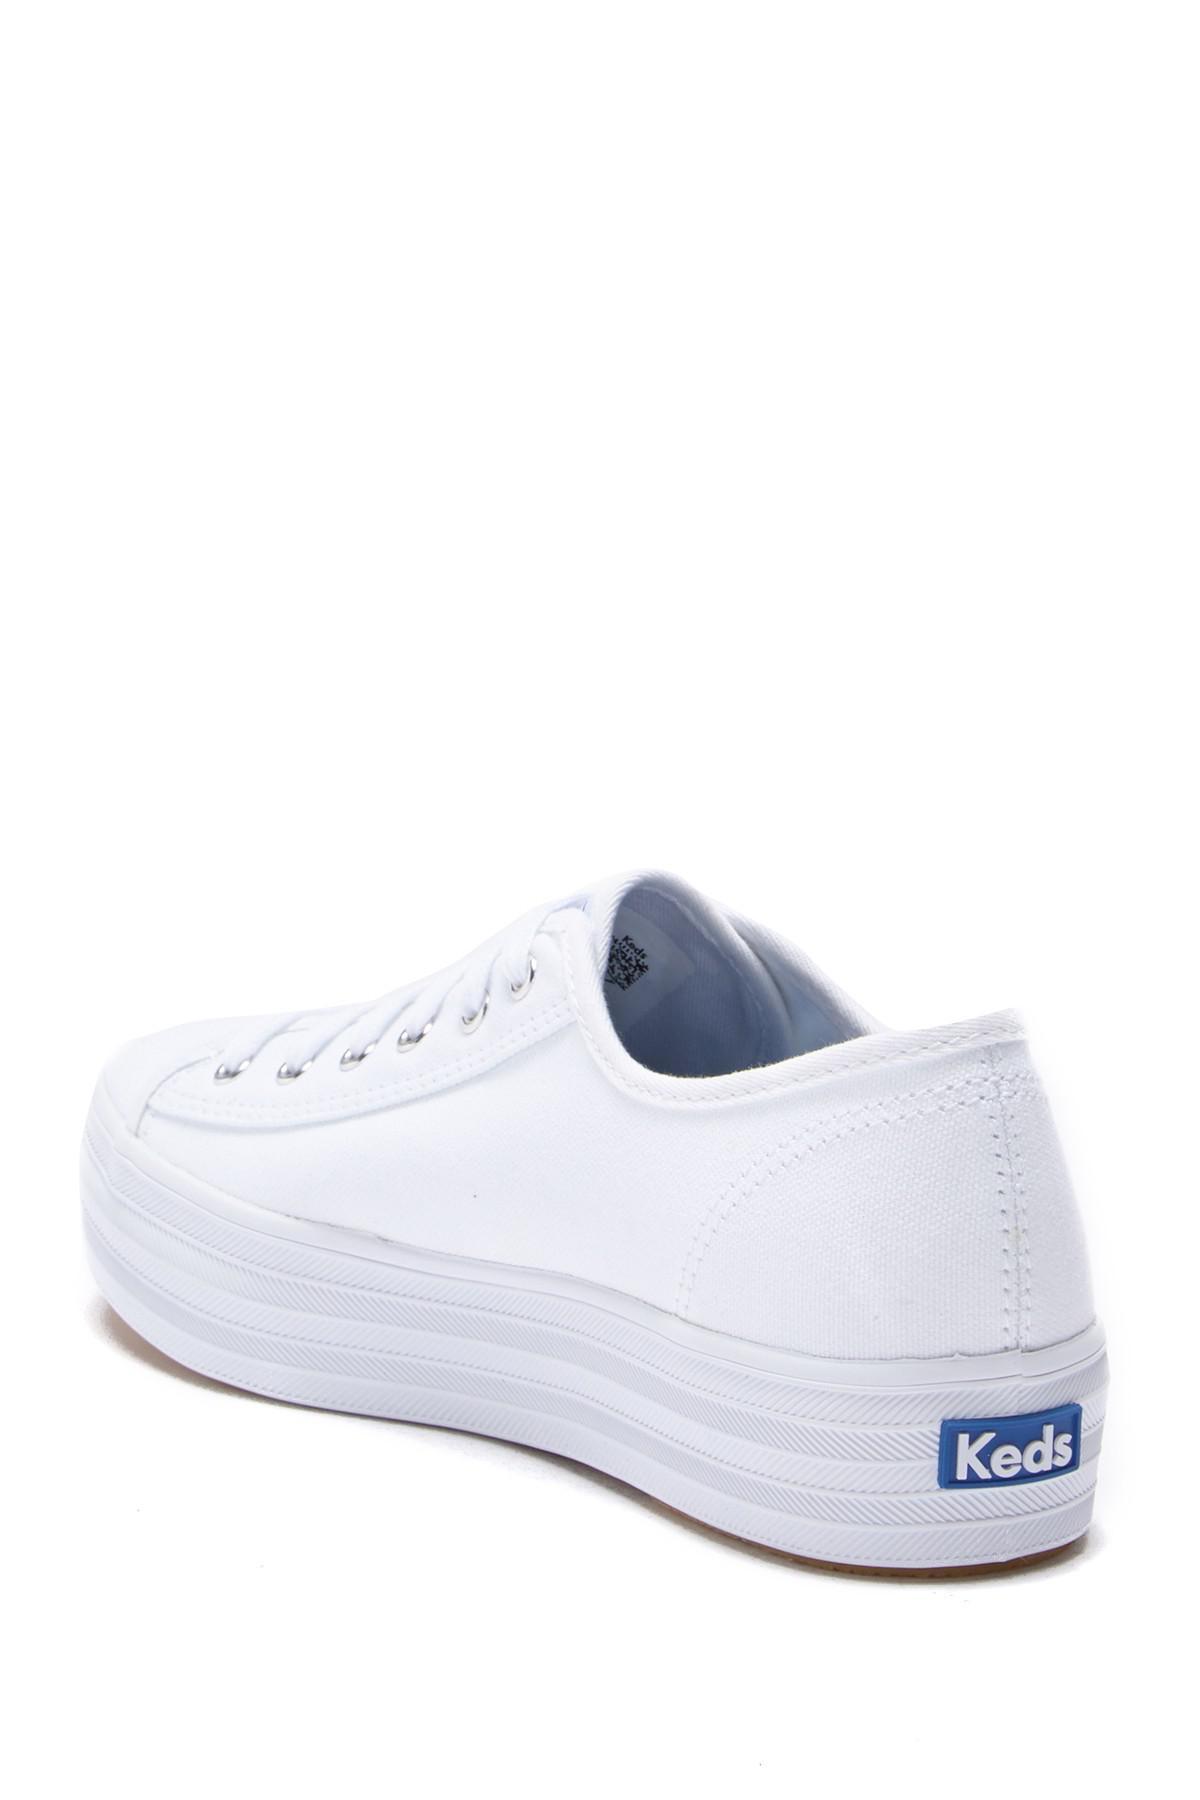 a64a1b6ce1b9e Keds - Triple Kick Canvas (white) Women s Lace Up Casual Shoes - Lyst. View  fullscreen